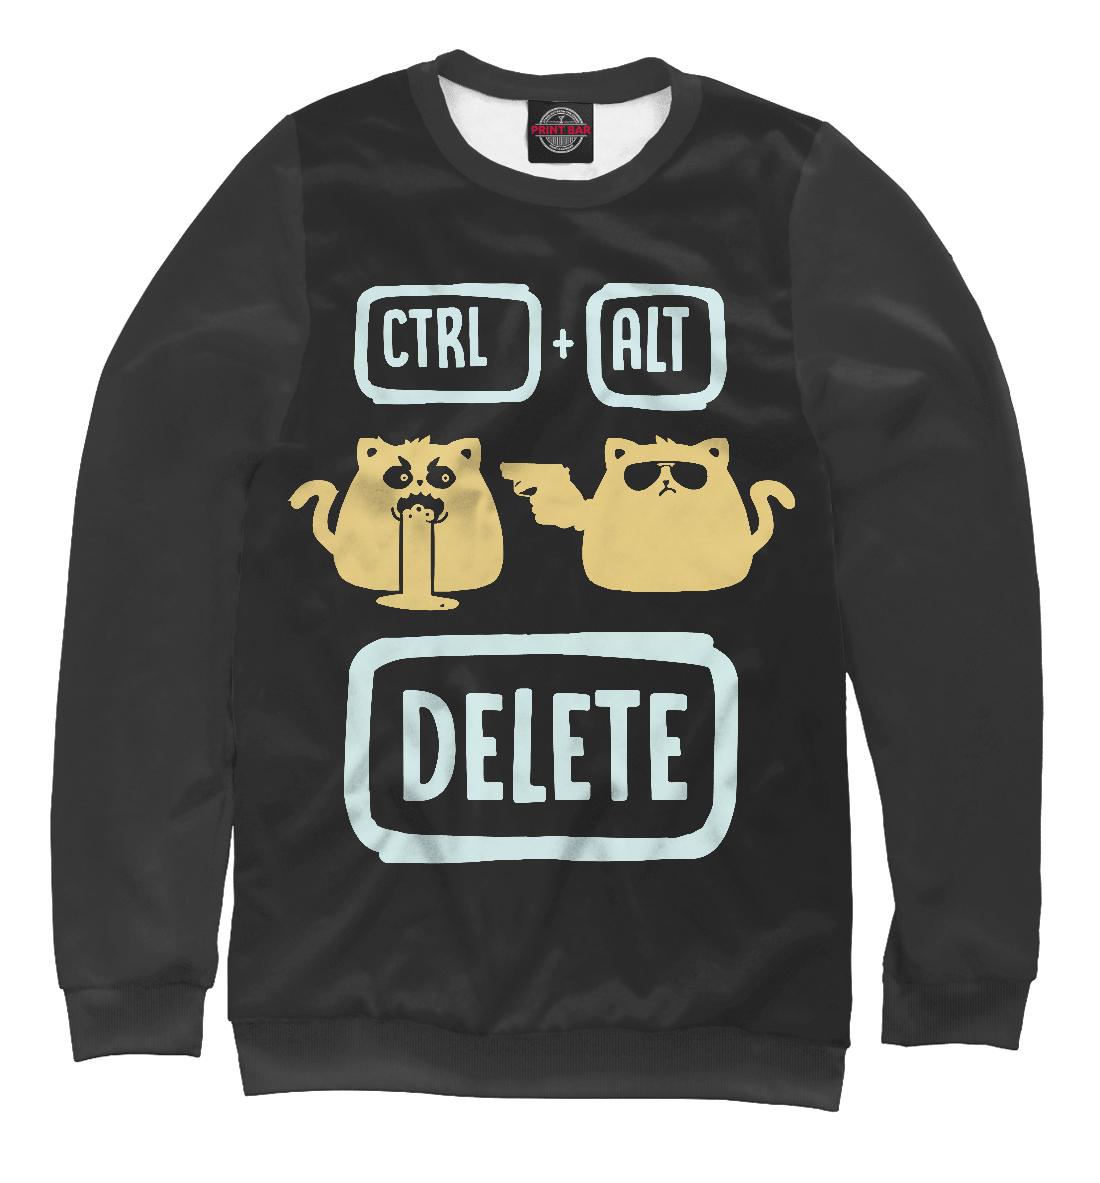 (Shortcat) Ctrl+Alt+Delete